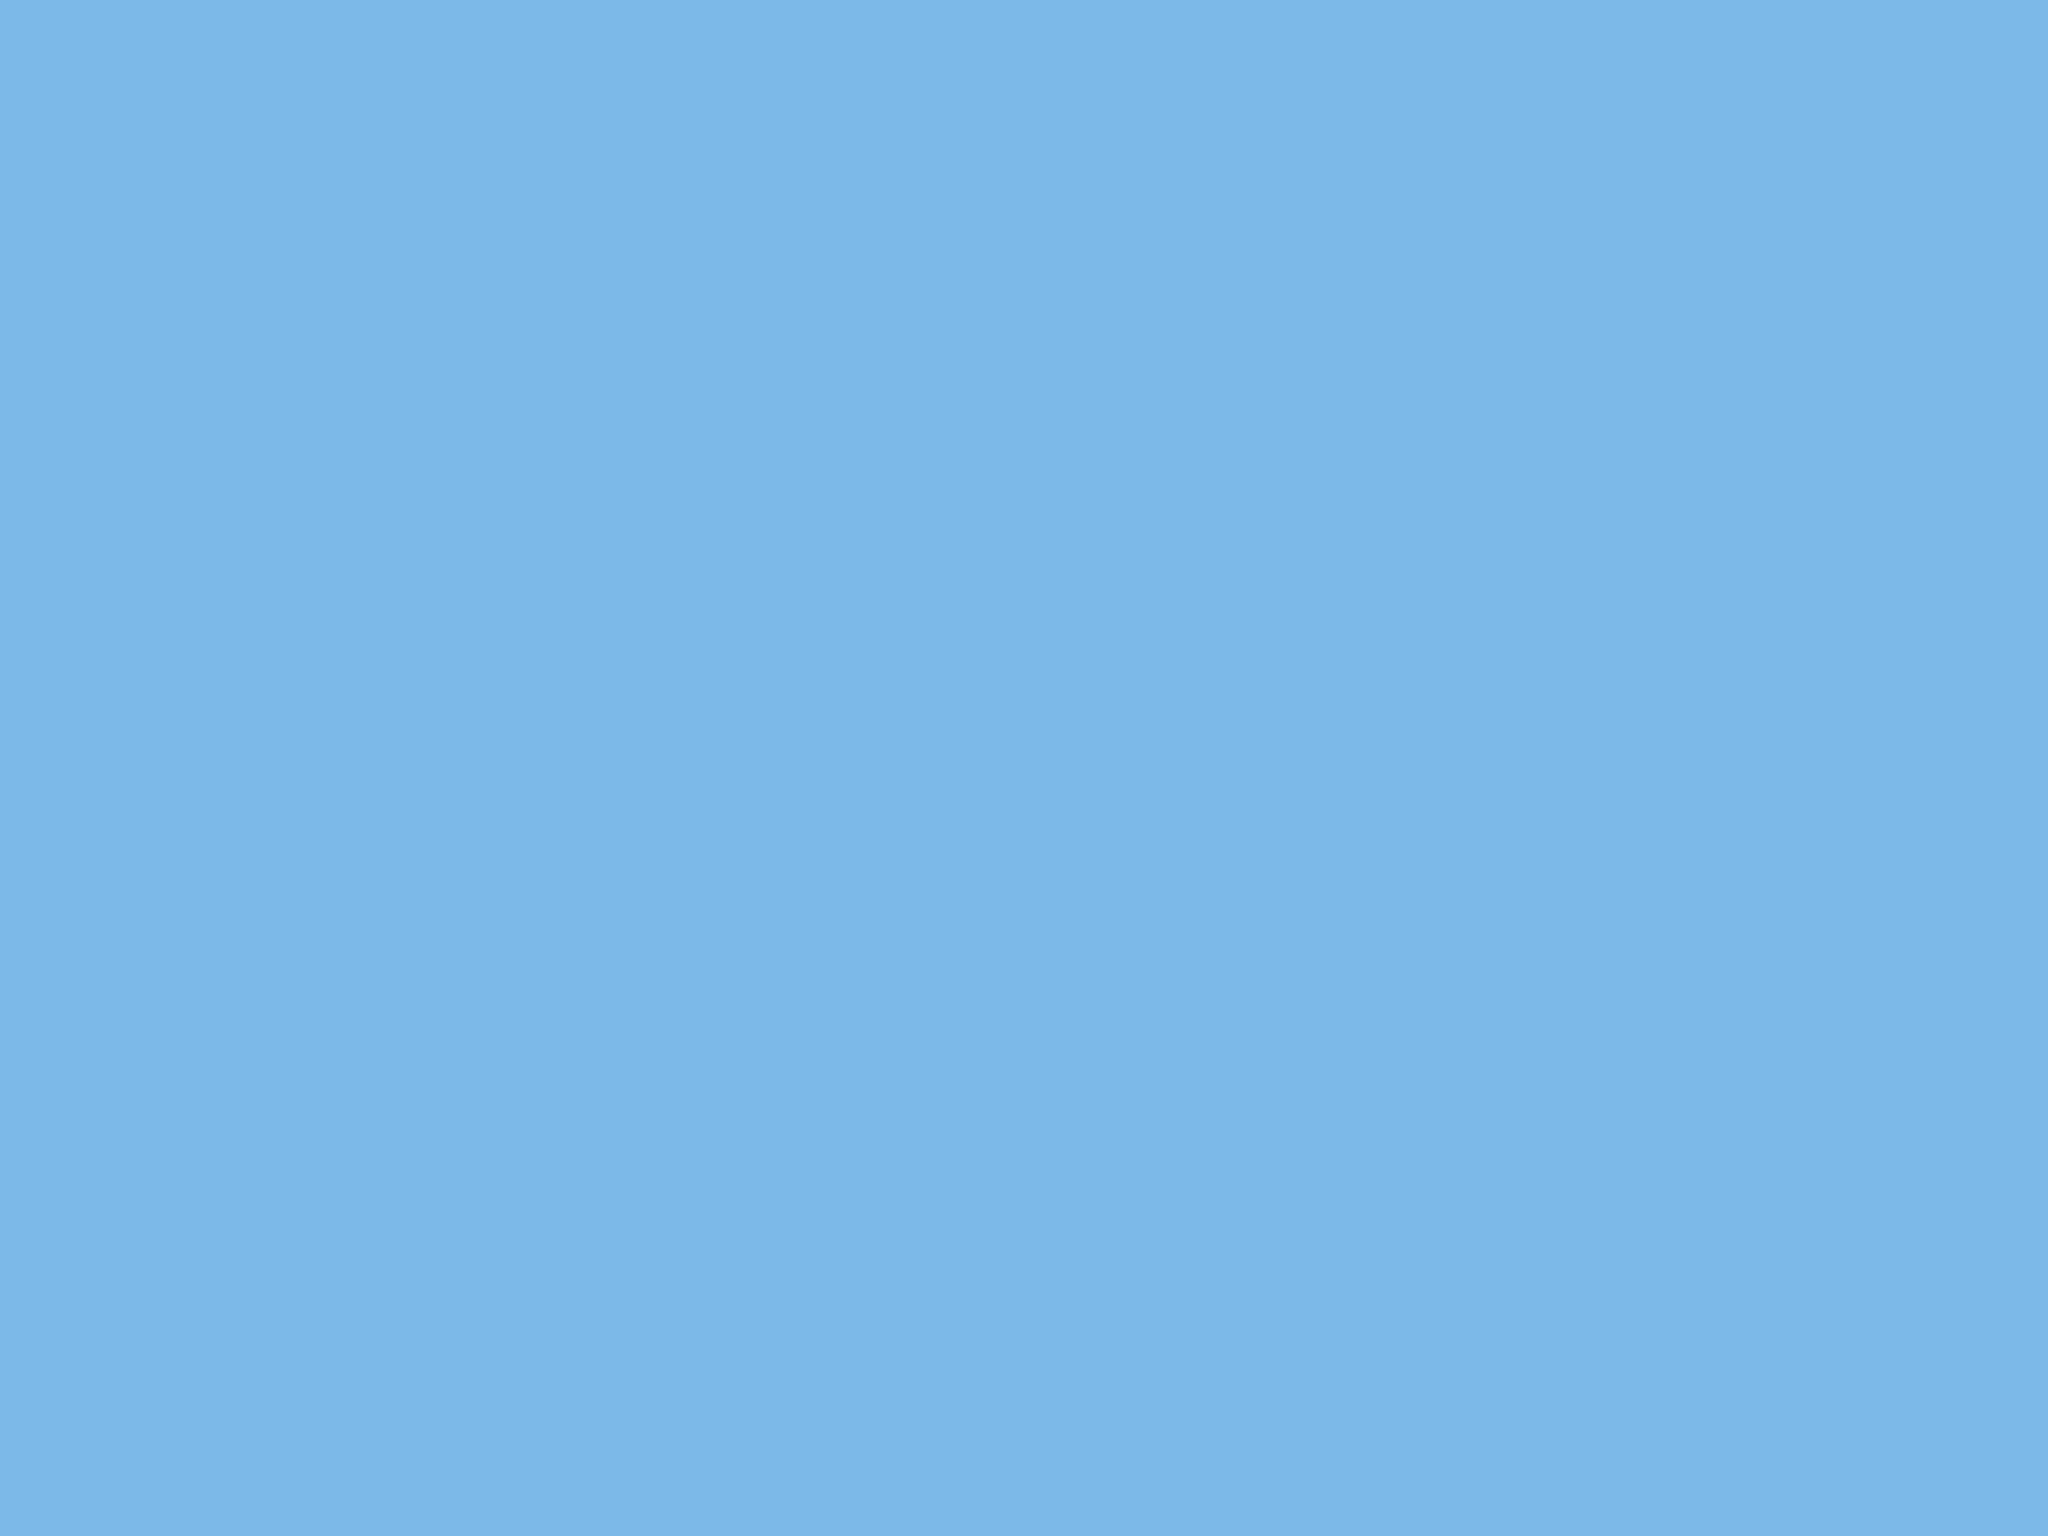 2048x1536 Aero Solid Color Background